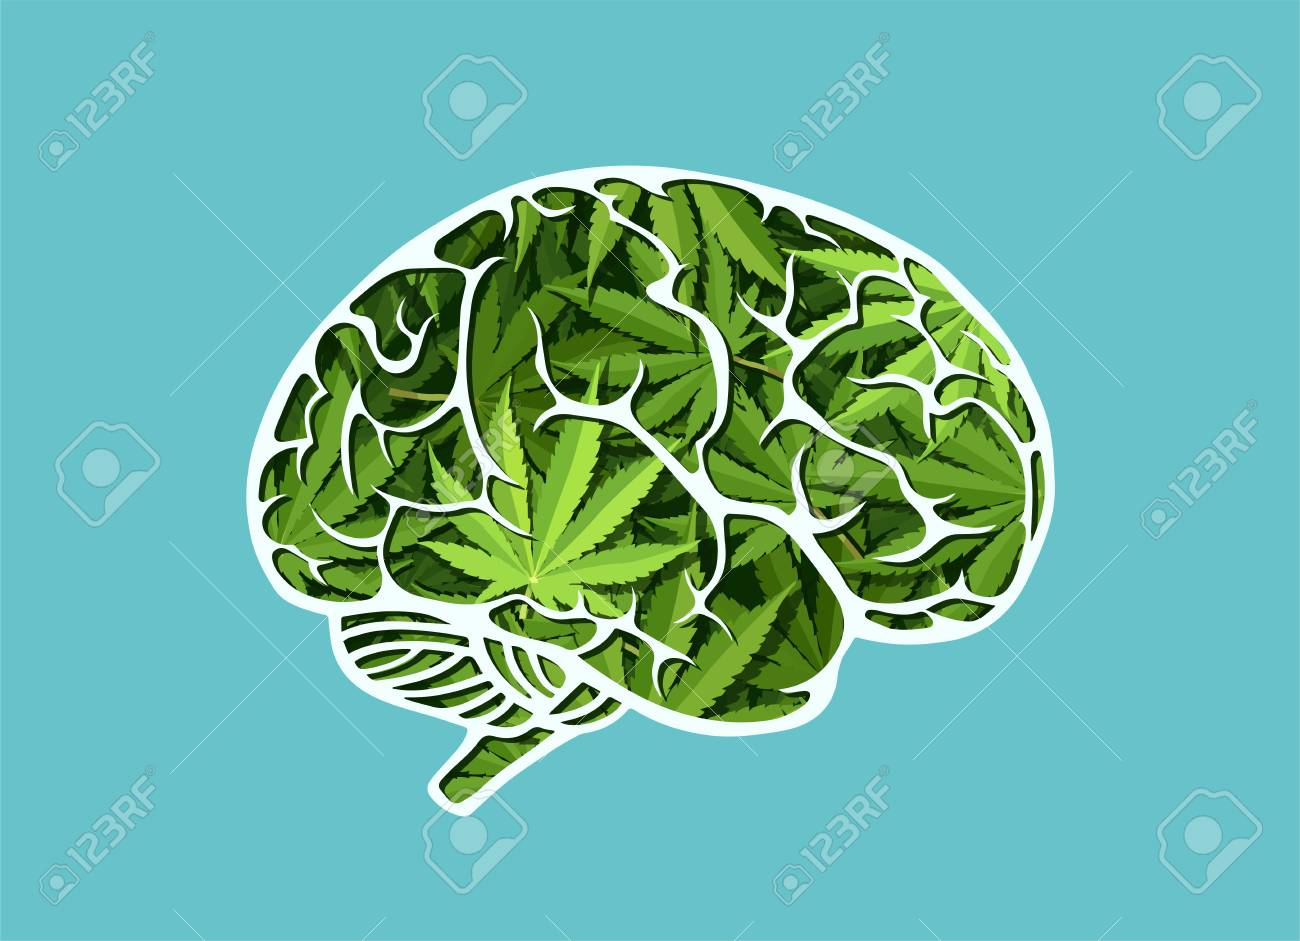 Vector of a human brain made of marijuana leaves - 103964462